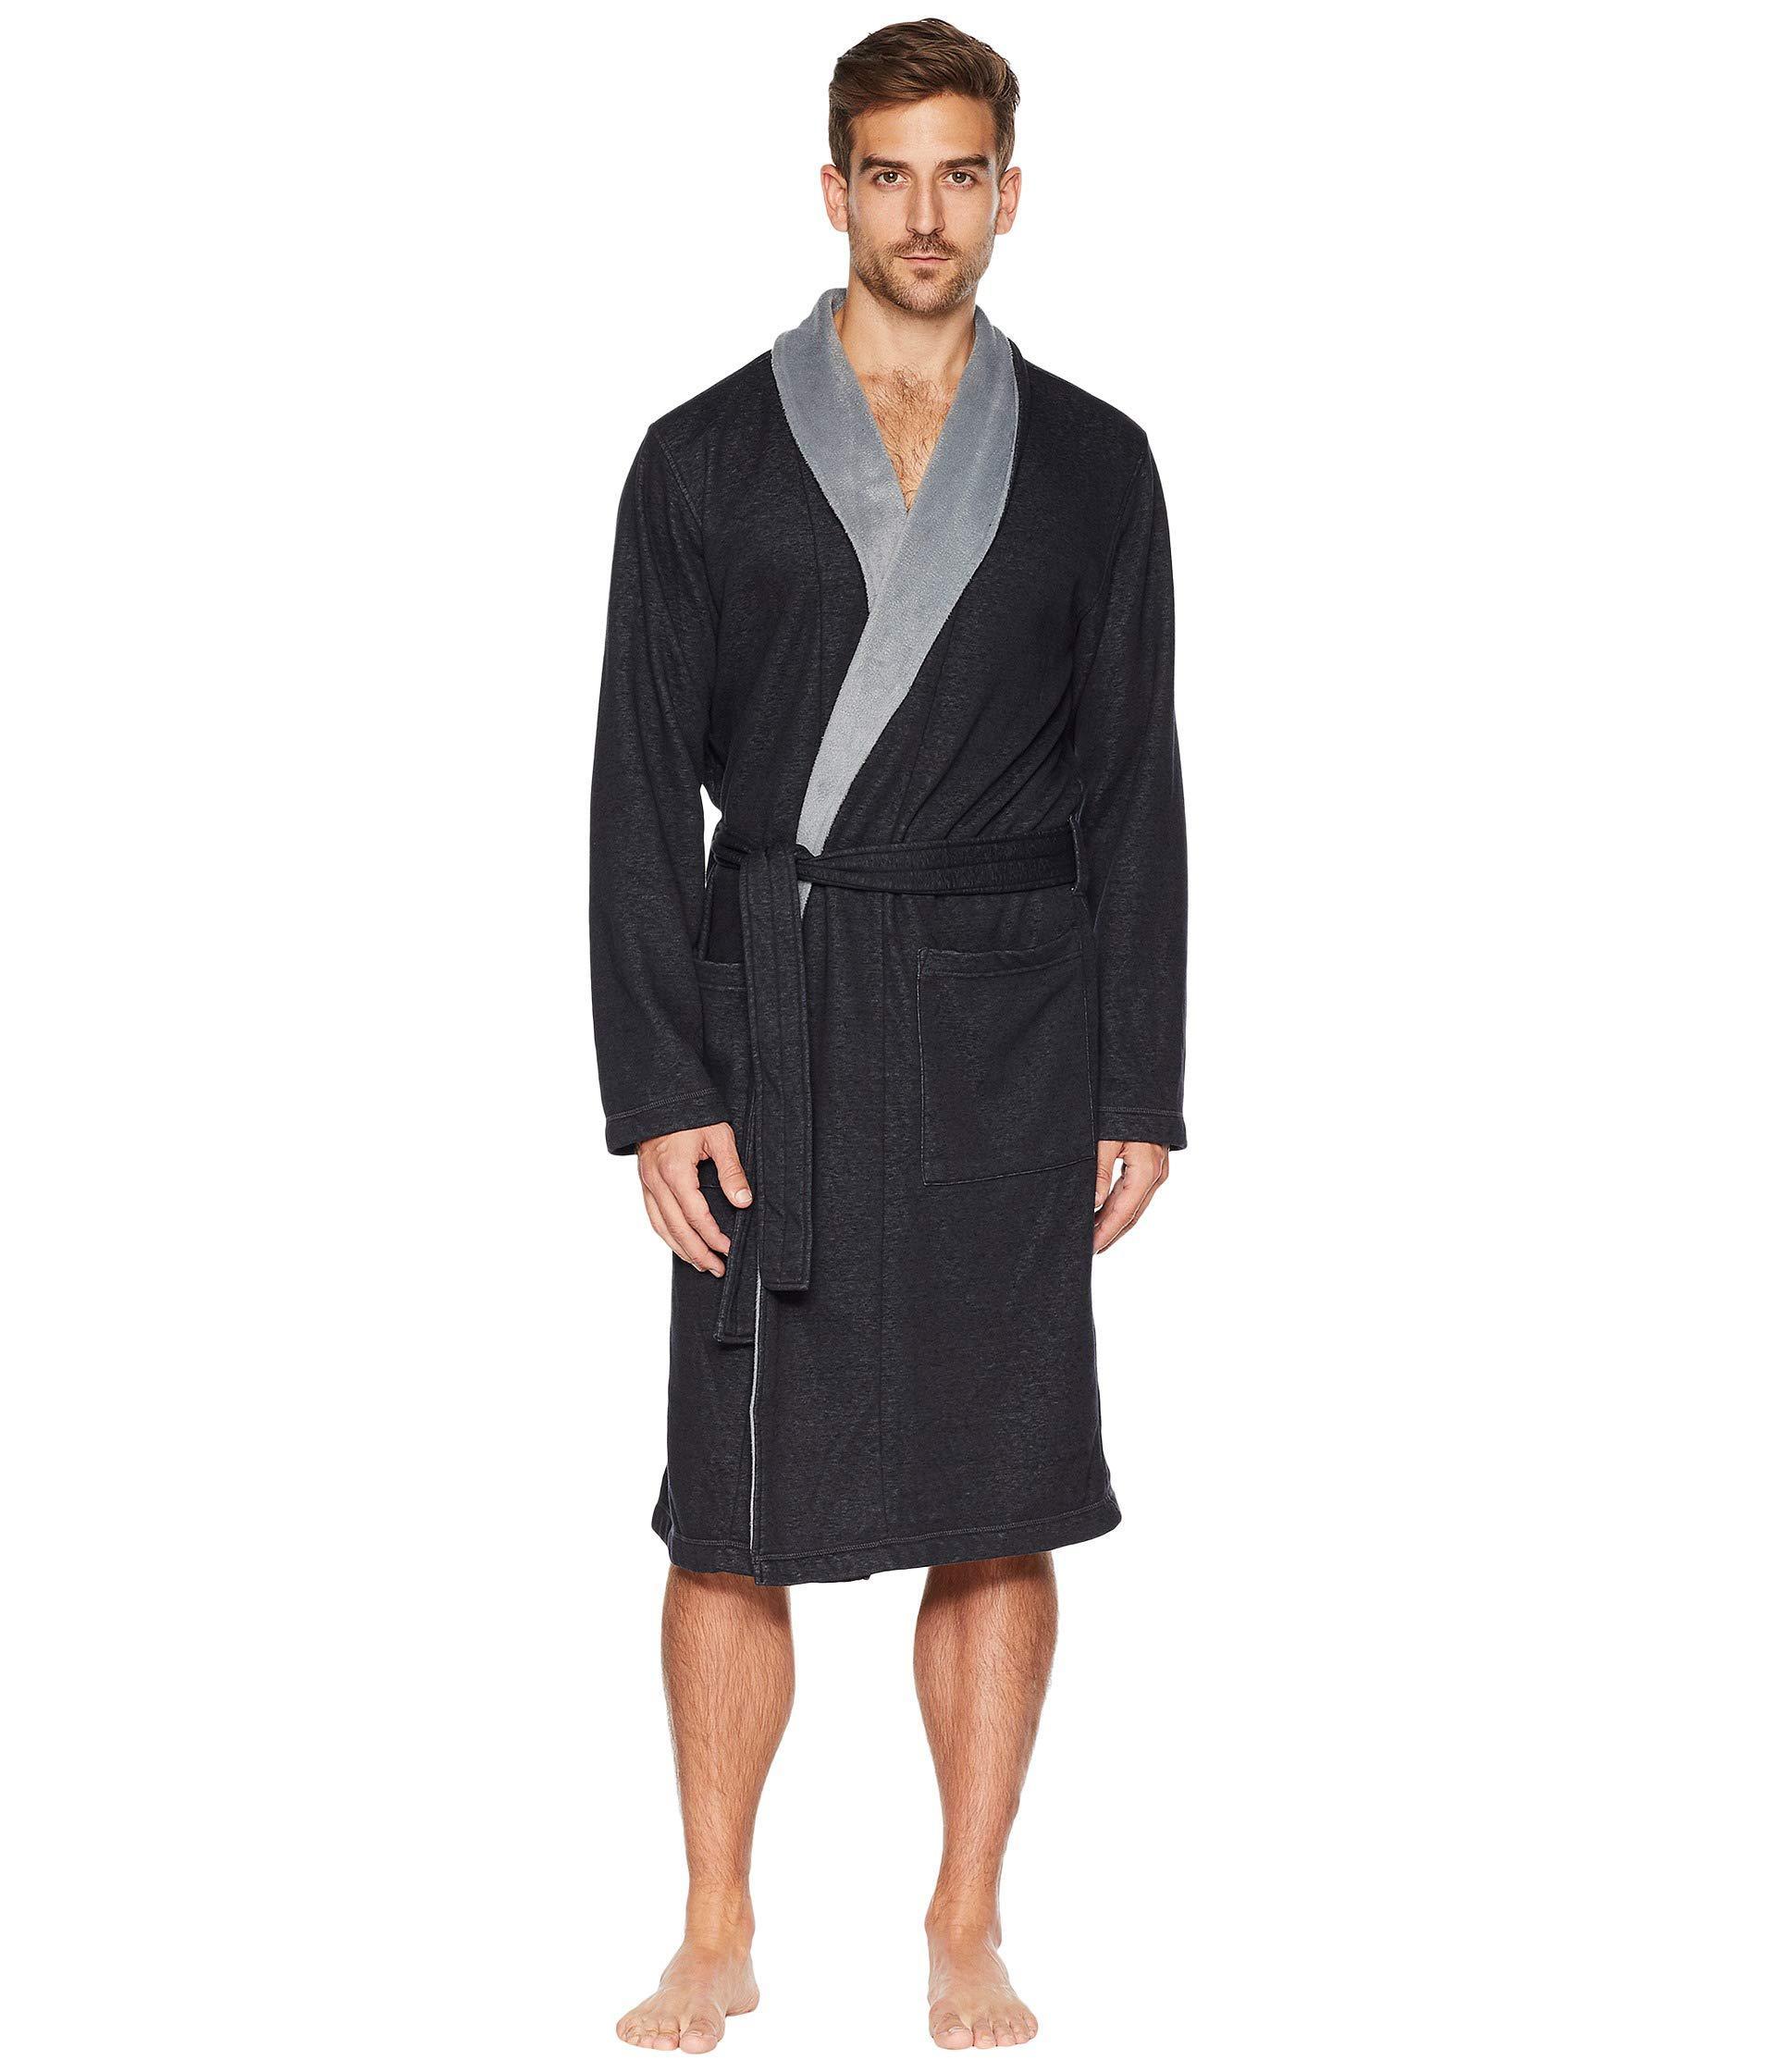 f0091201fd Lyst - UGG Robinson Robe (grey Heather) Men s Robe in Black for Men